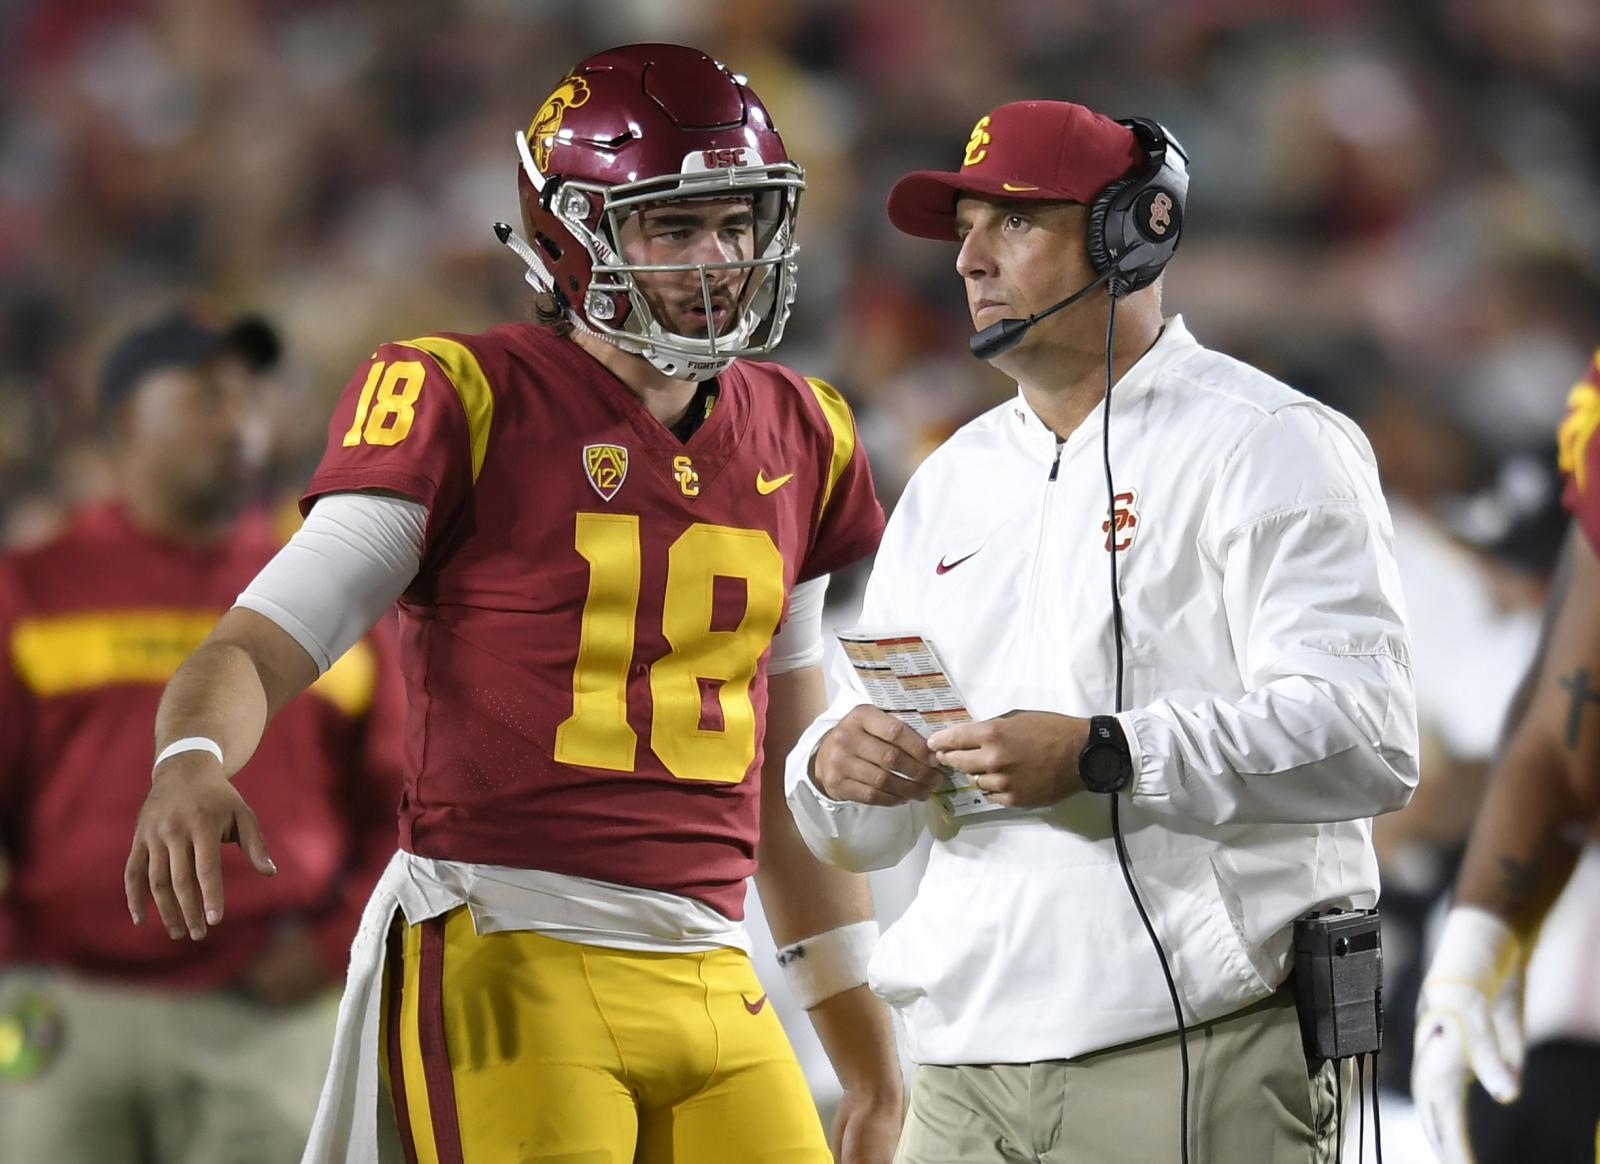 USC Football: Arizona State Sun Devils stun Trojans at Coliseum